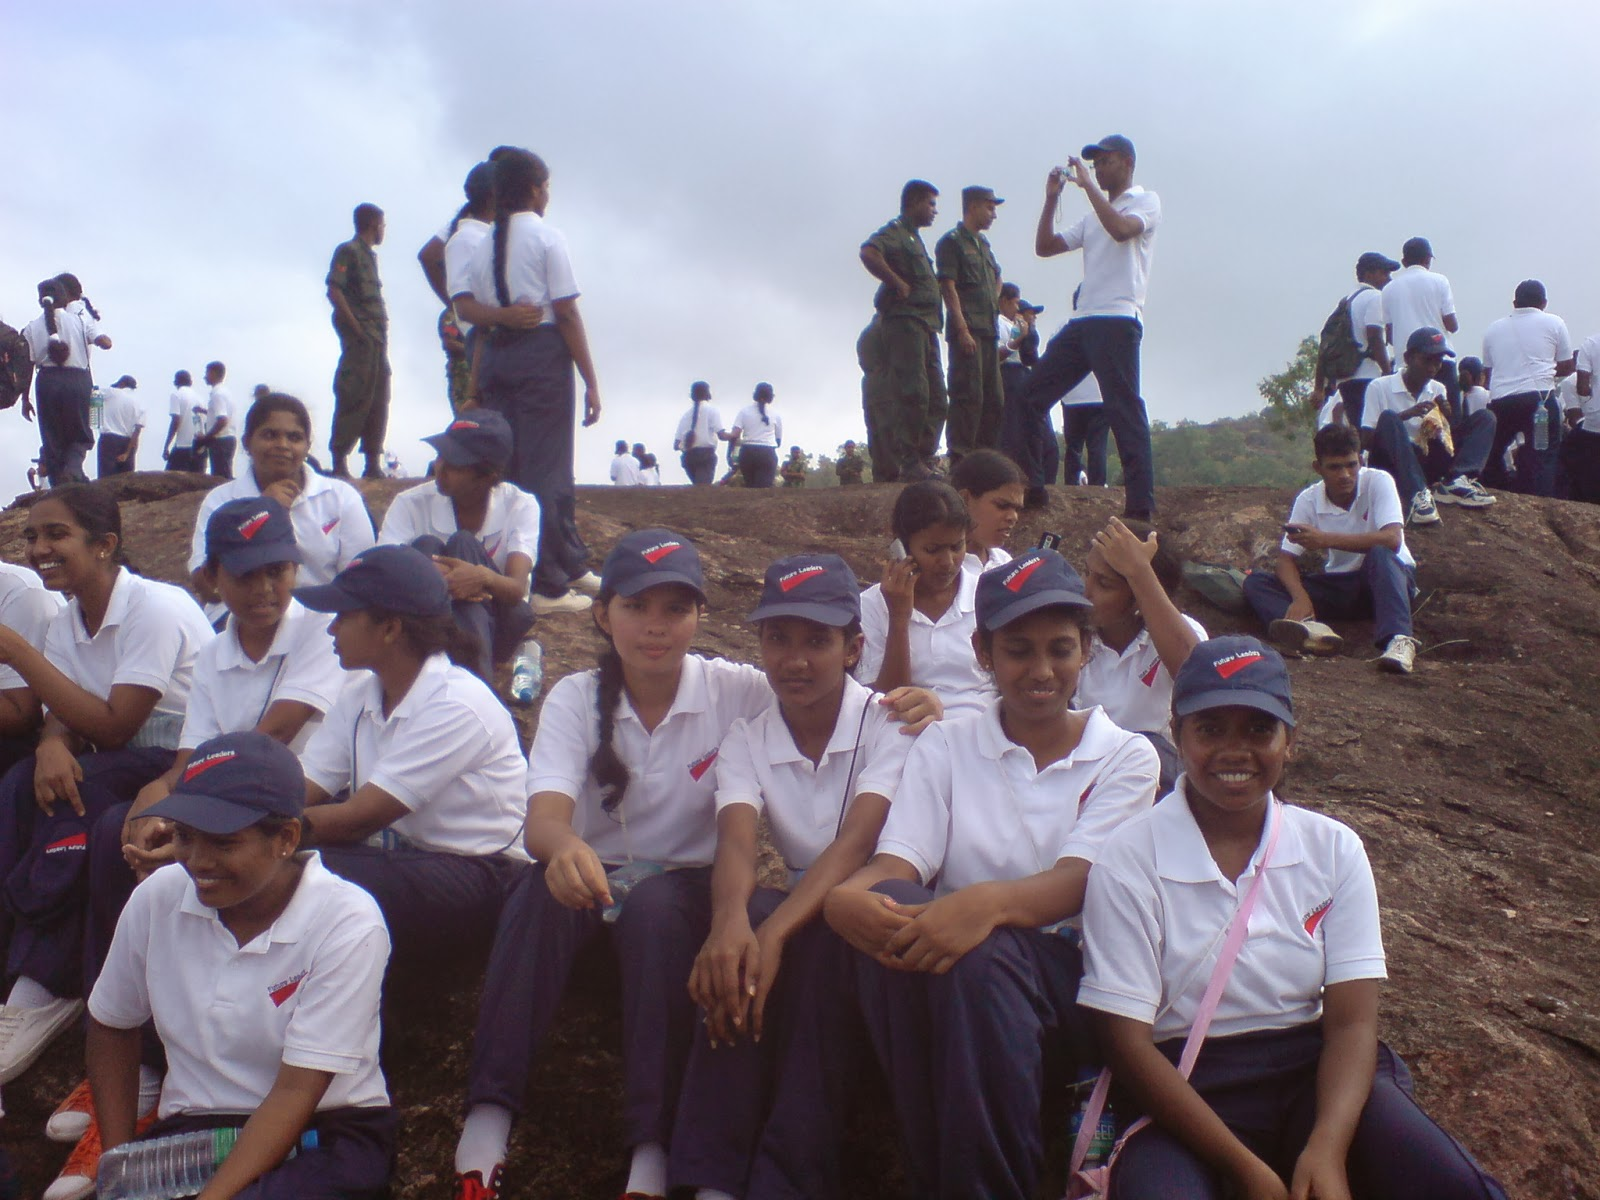 Lanka campus leadership camp peradeniya 8